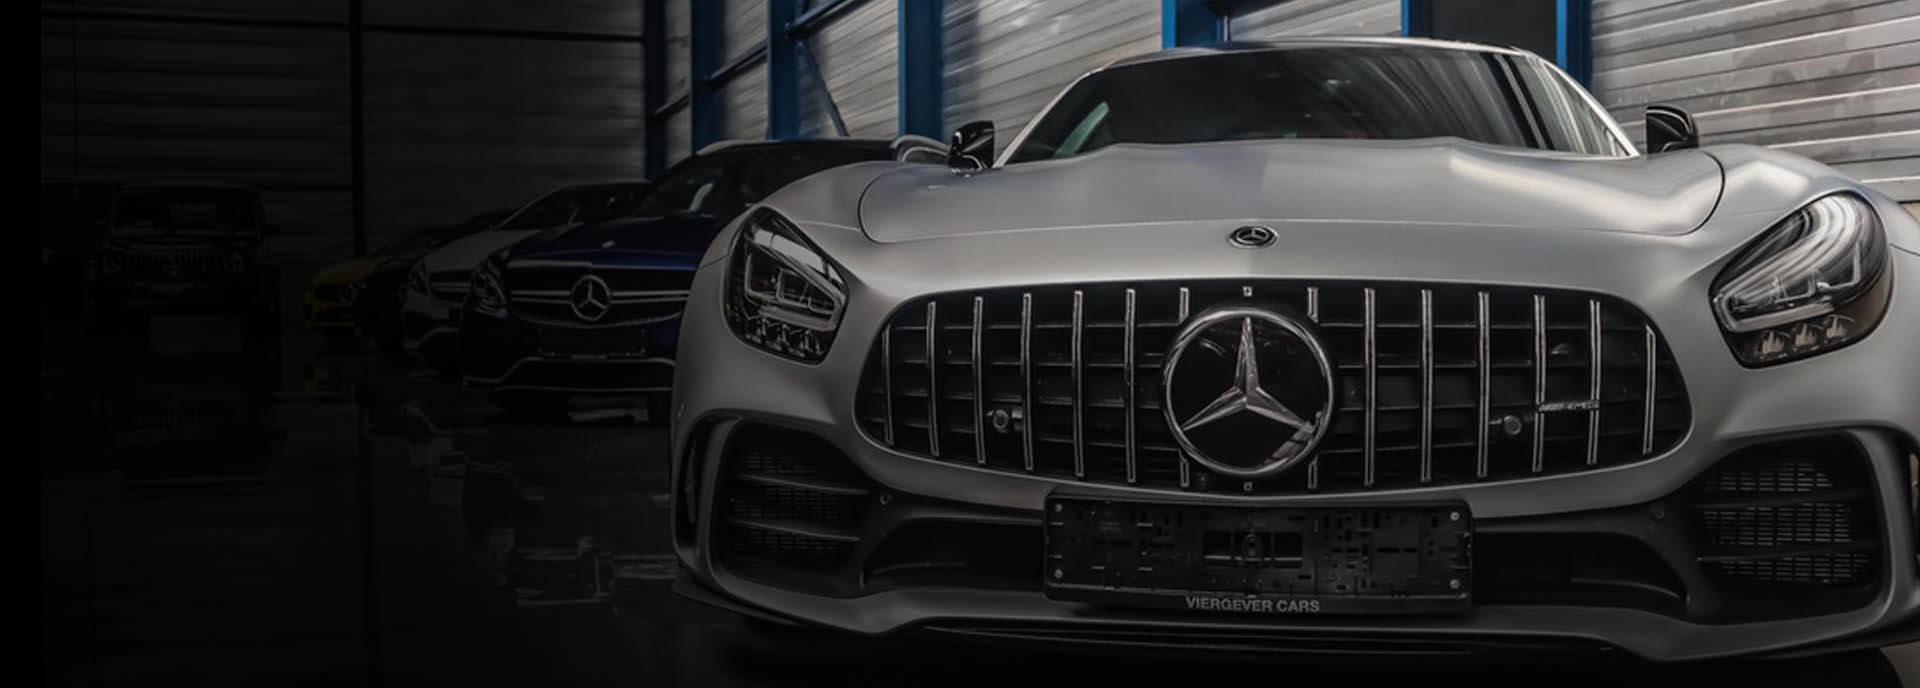 Viergever Cars Luxe Autowebsite